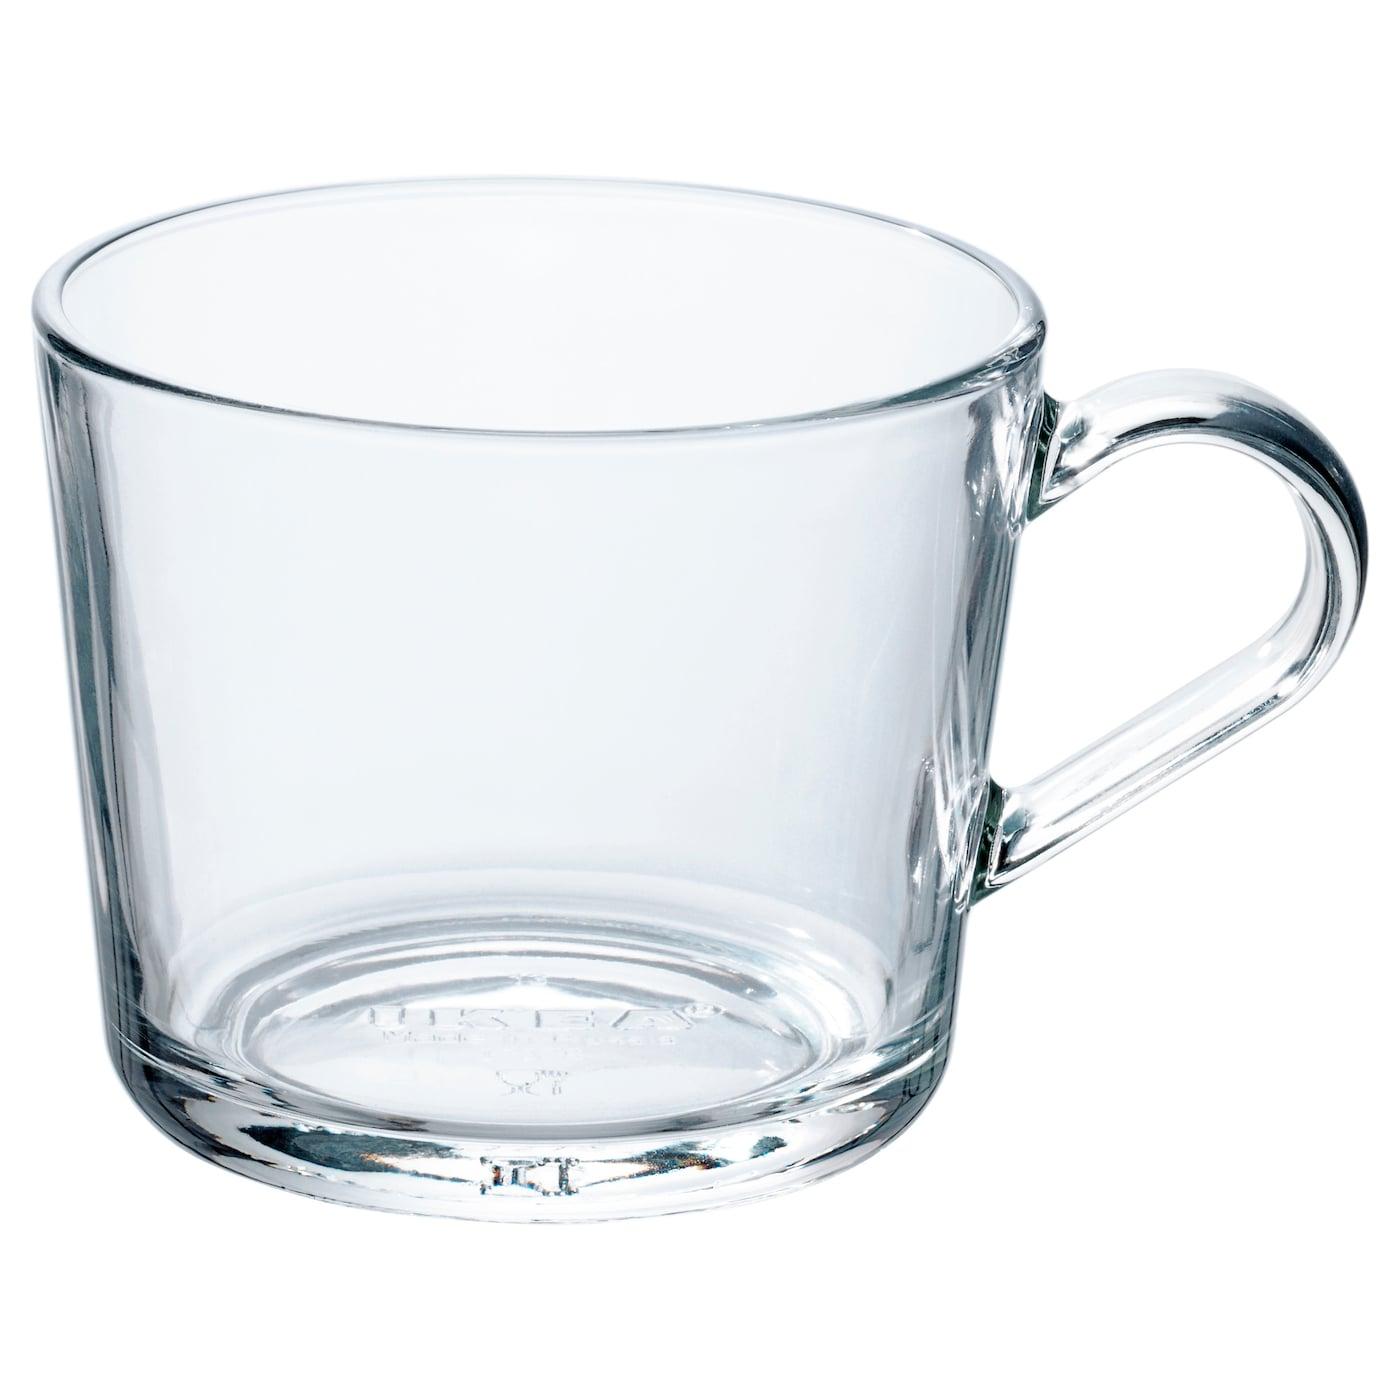 ikea 365 mug clear glass 36 cl ikea. Black Bedroom Furniture Sets. Home Design Ideas